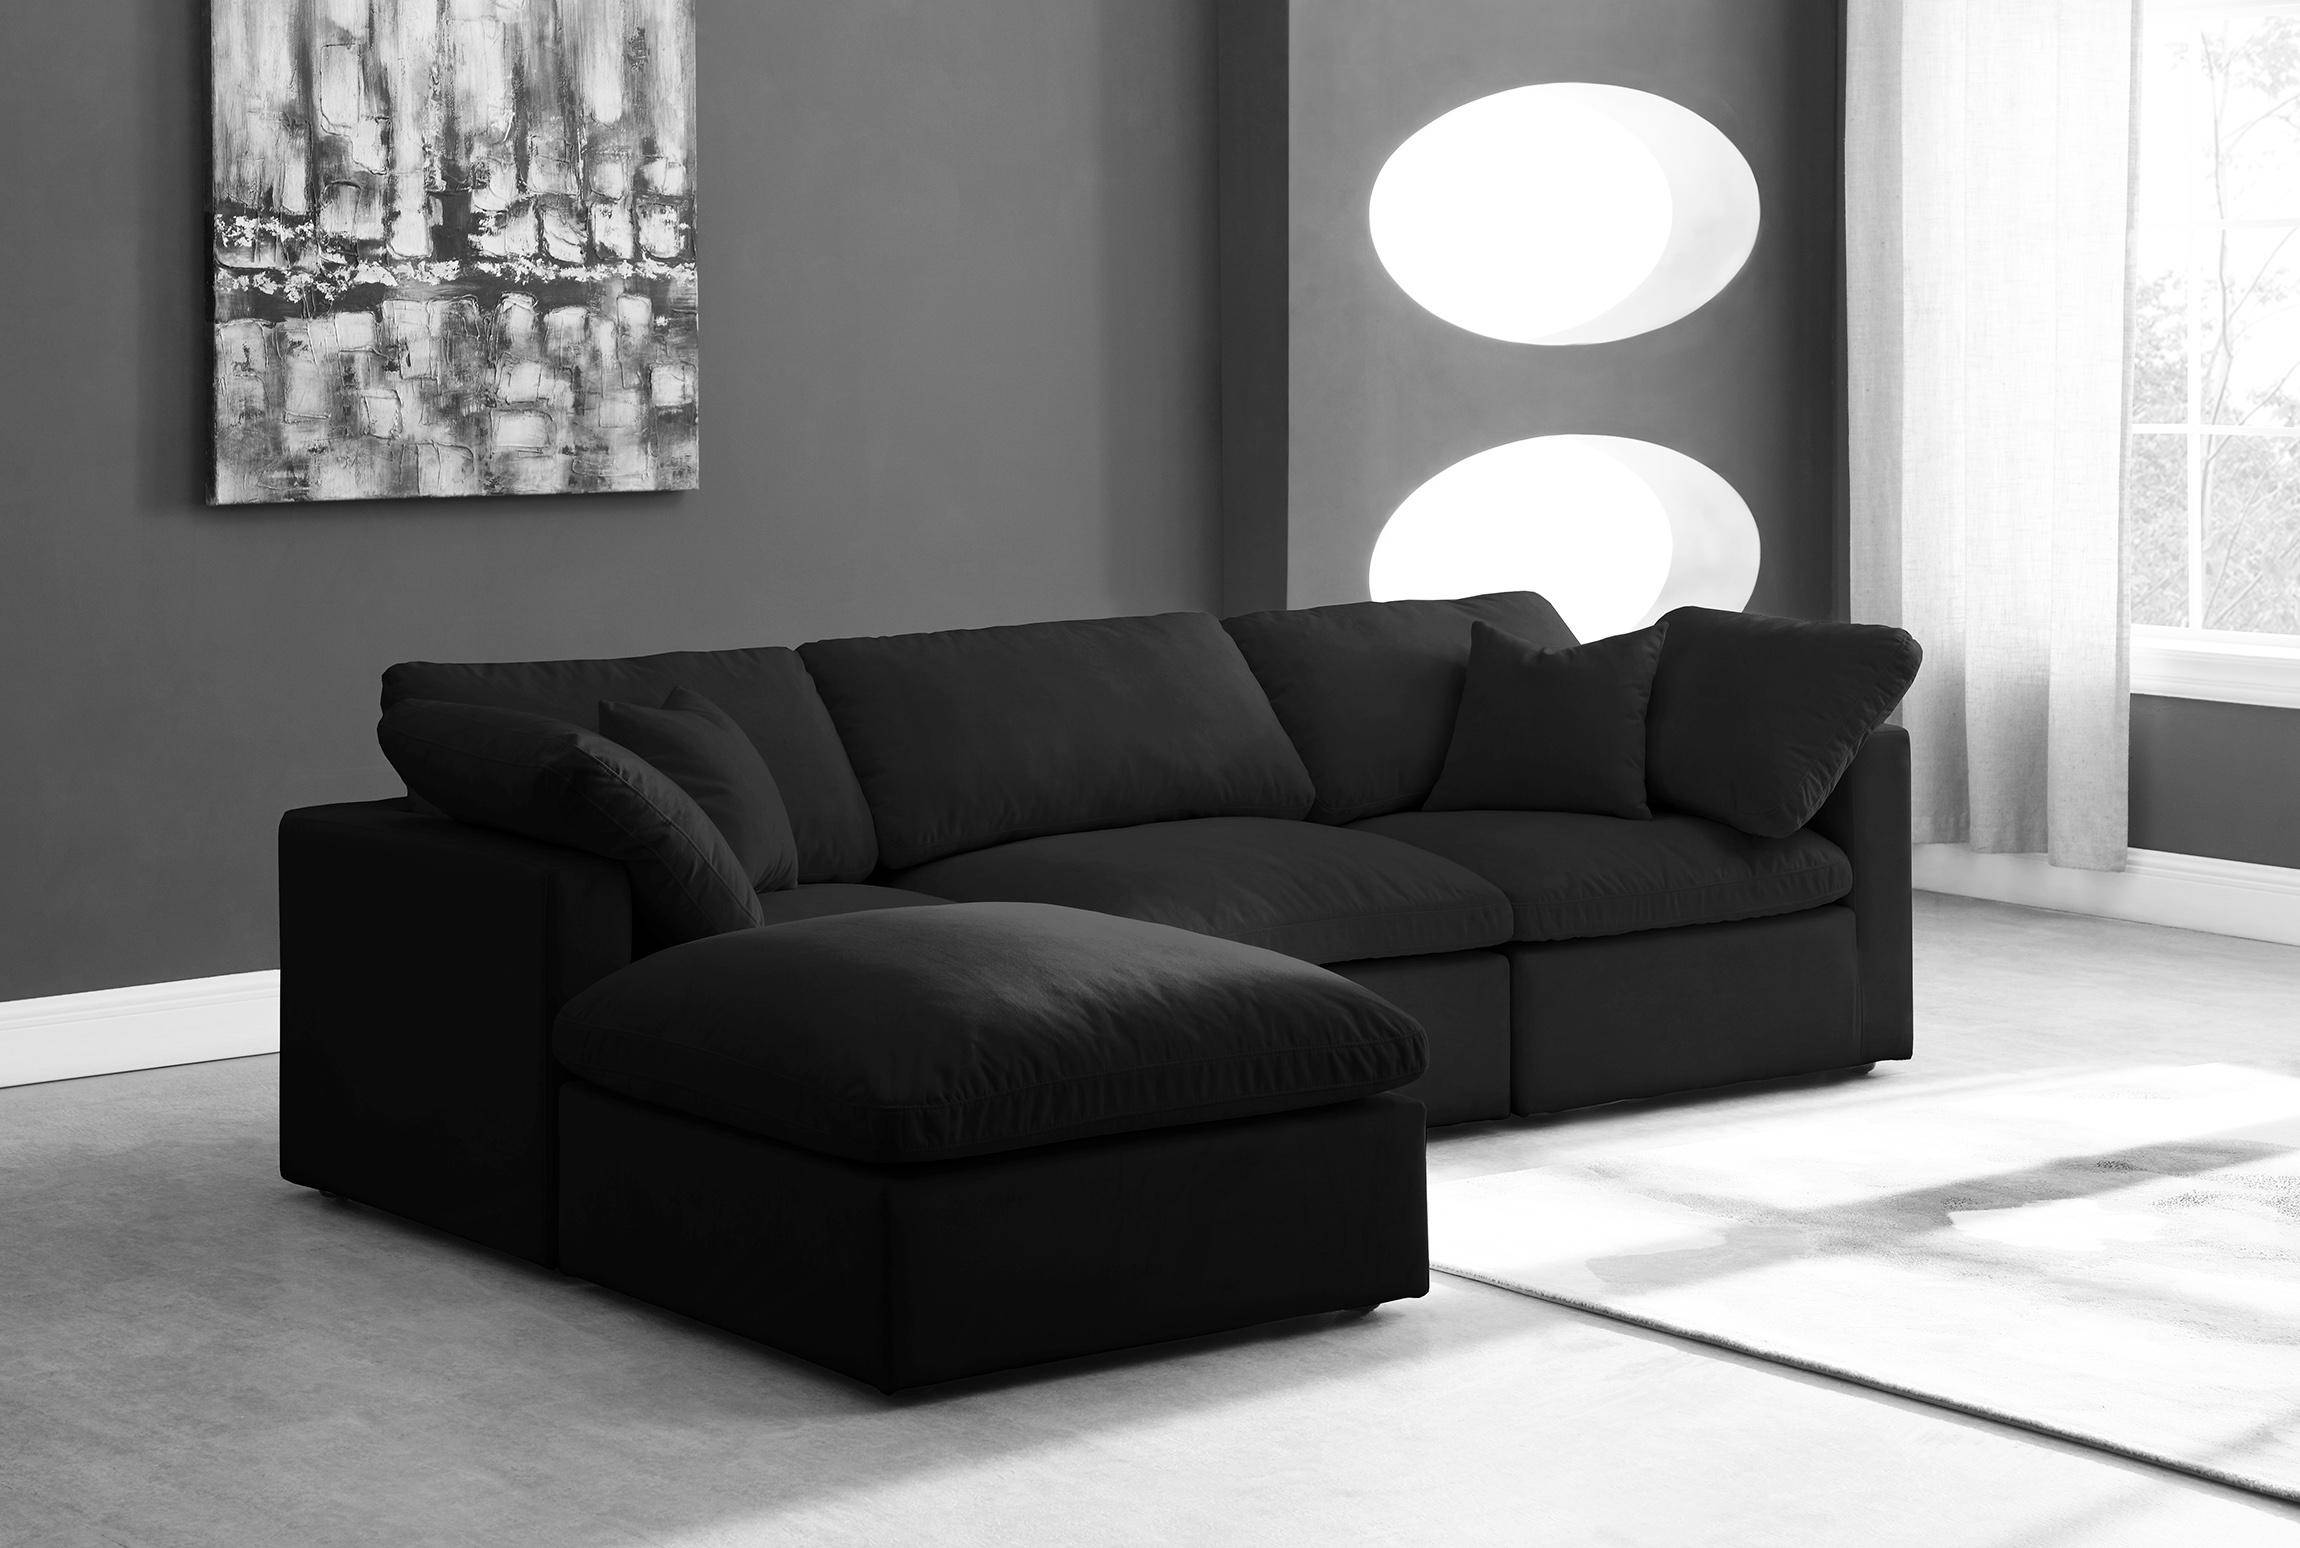 meridian cloud black modular sectional sofa in black fabric